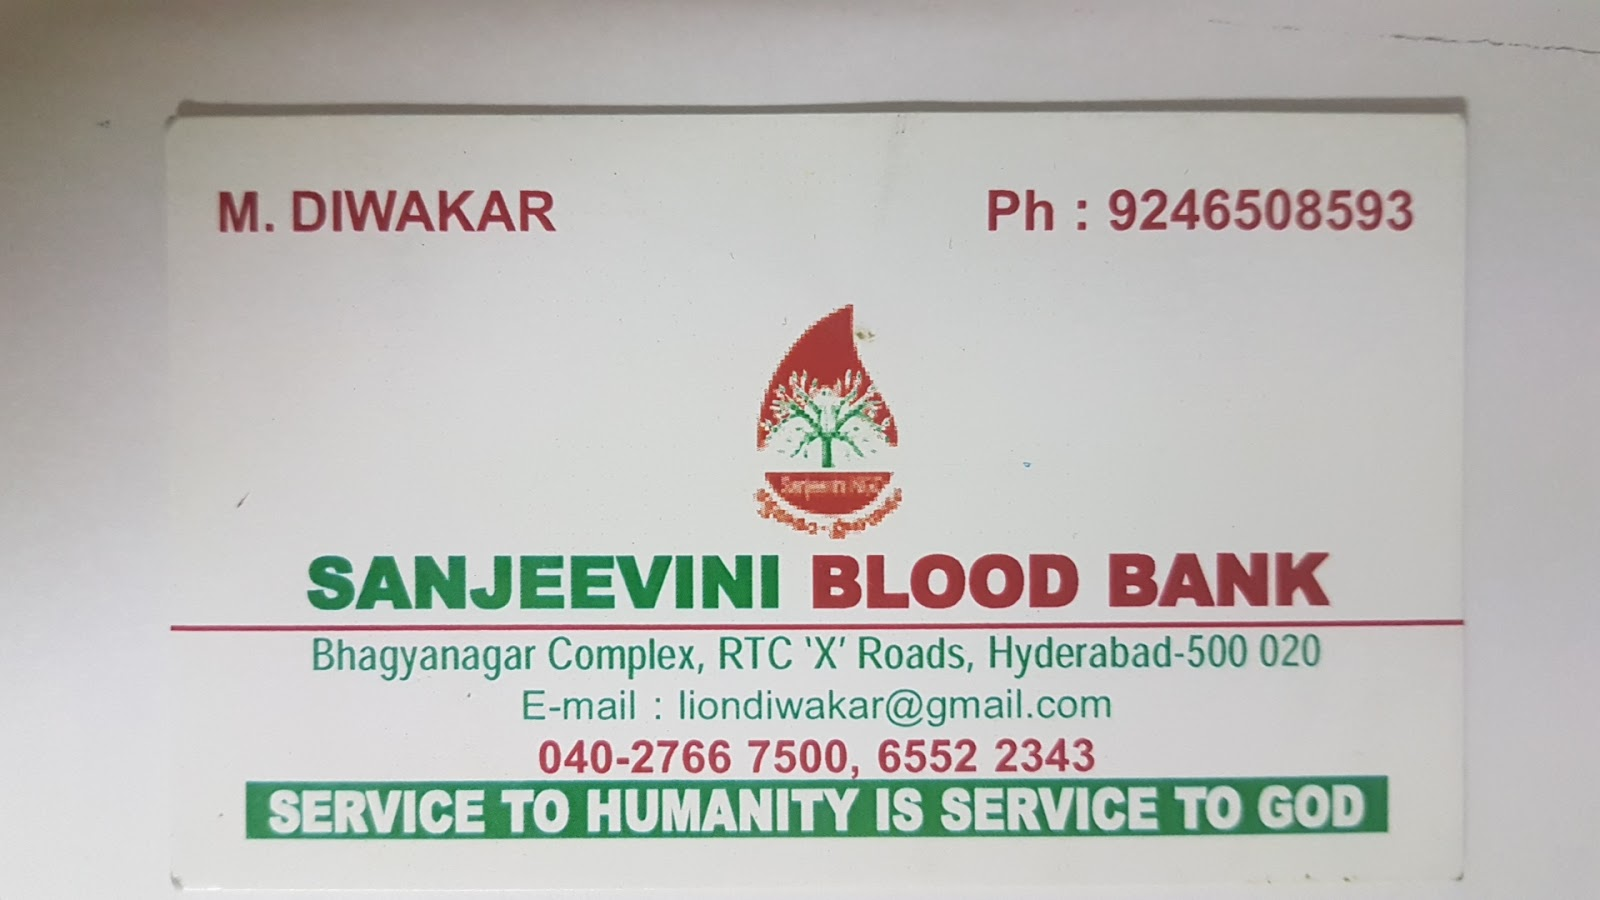 blood bank Sanjeevini Blood Bank near Hyderabad Telangana